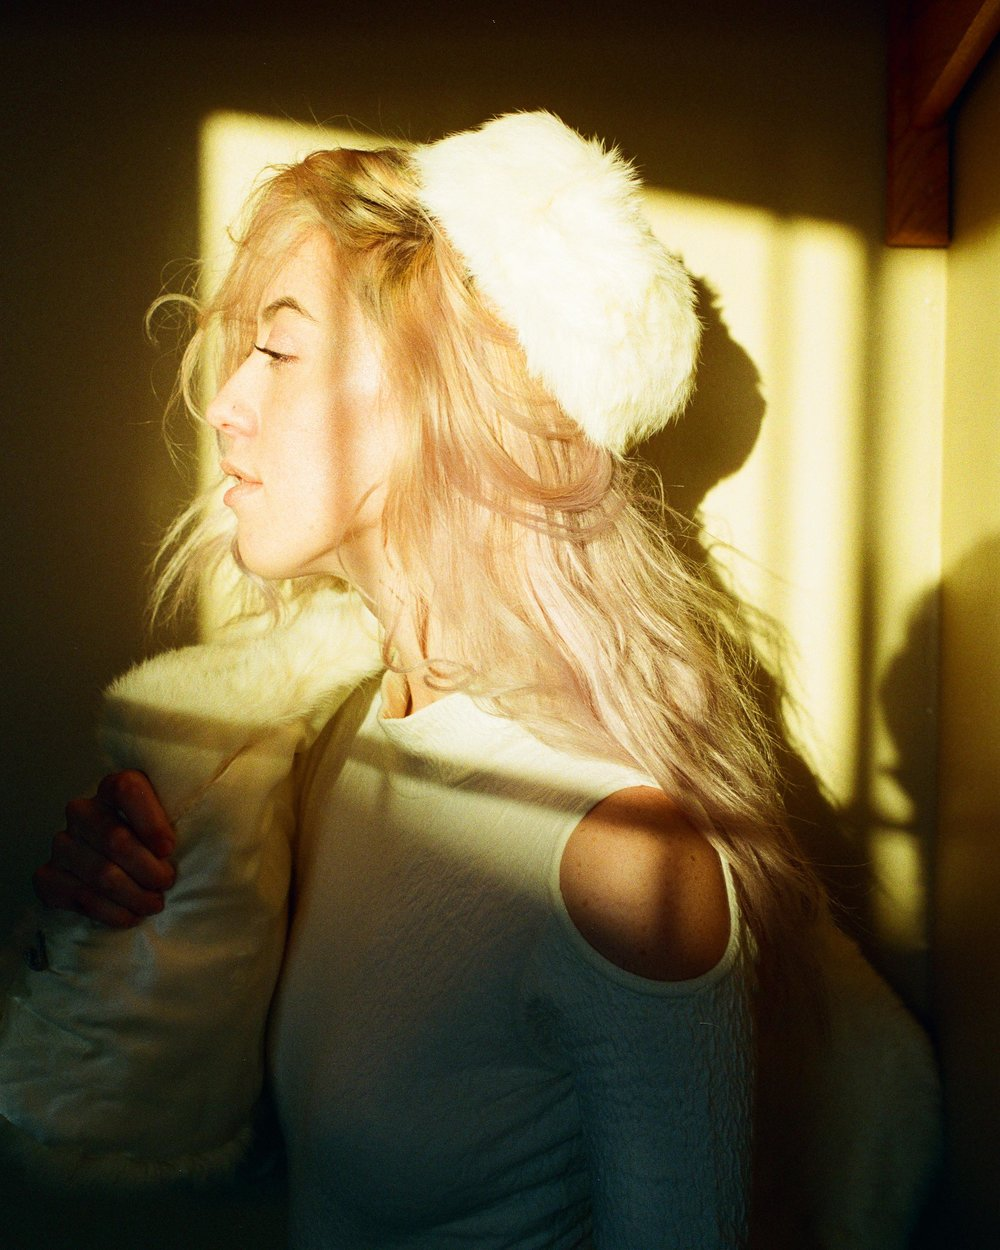 2017 12 Jess white-6-min.jpg